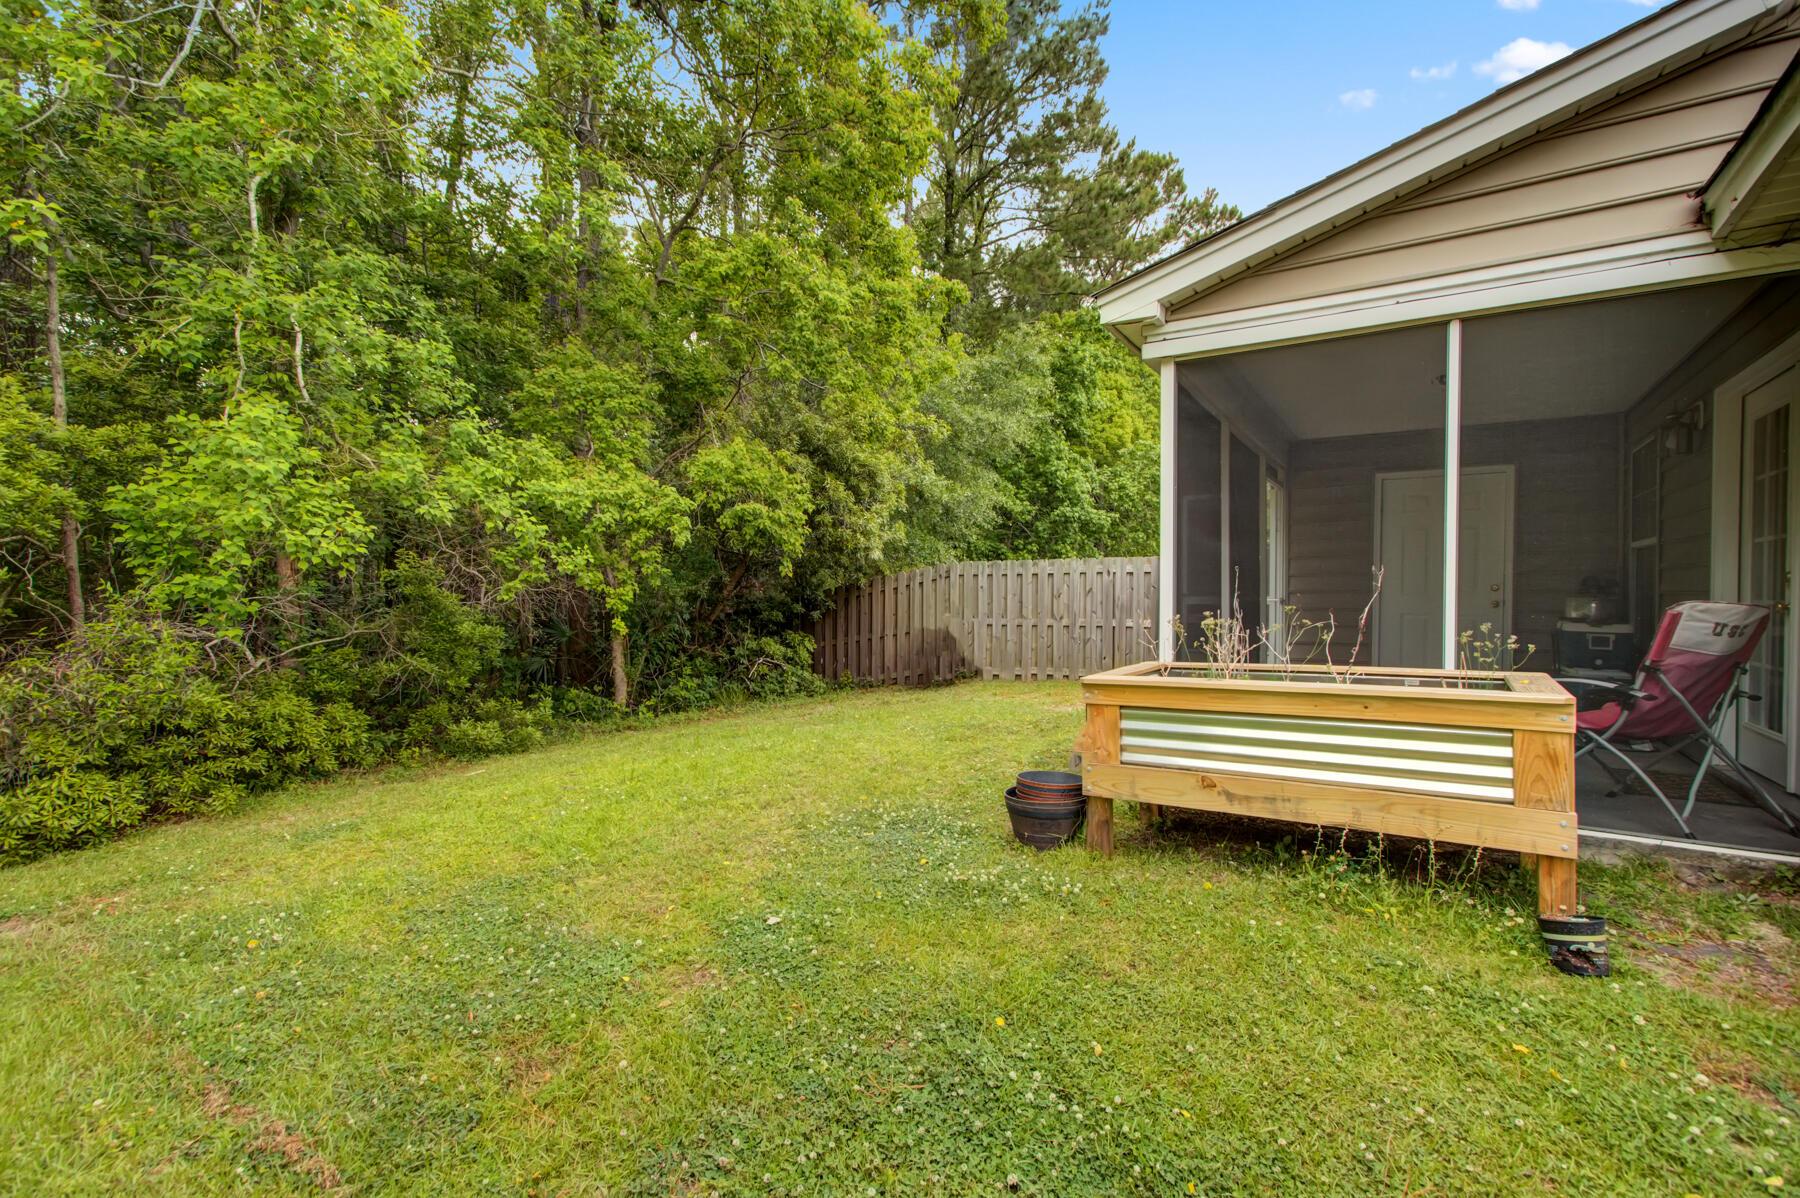 Dunes West Homes For Sale - 2232 Kings Gate, Mount Pleasant, SC - 12